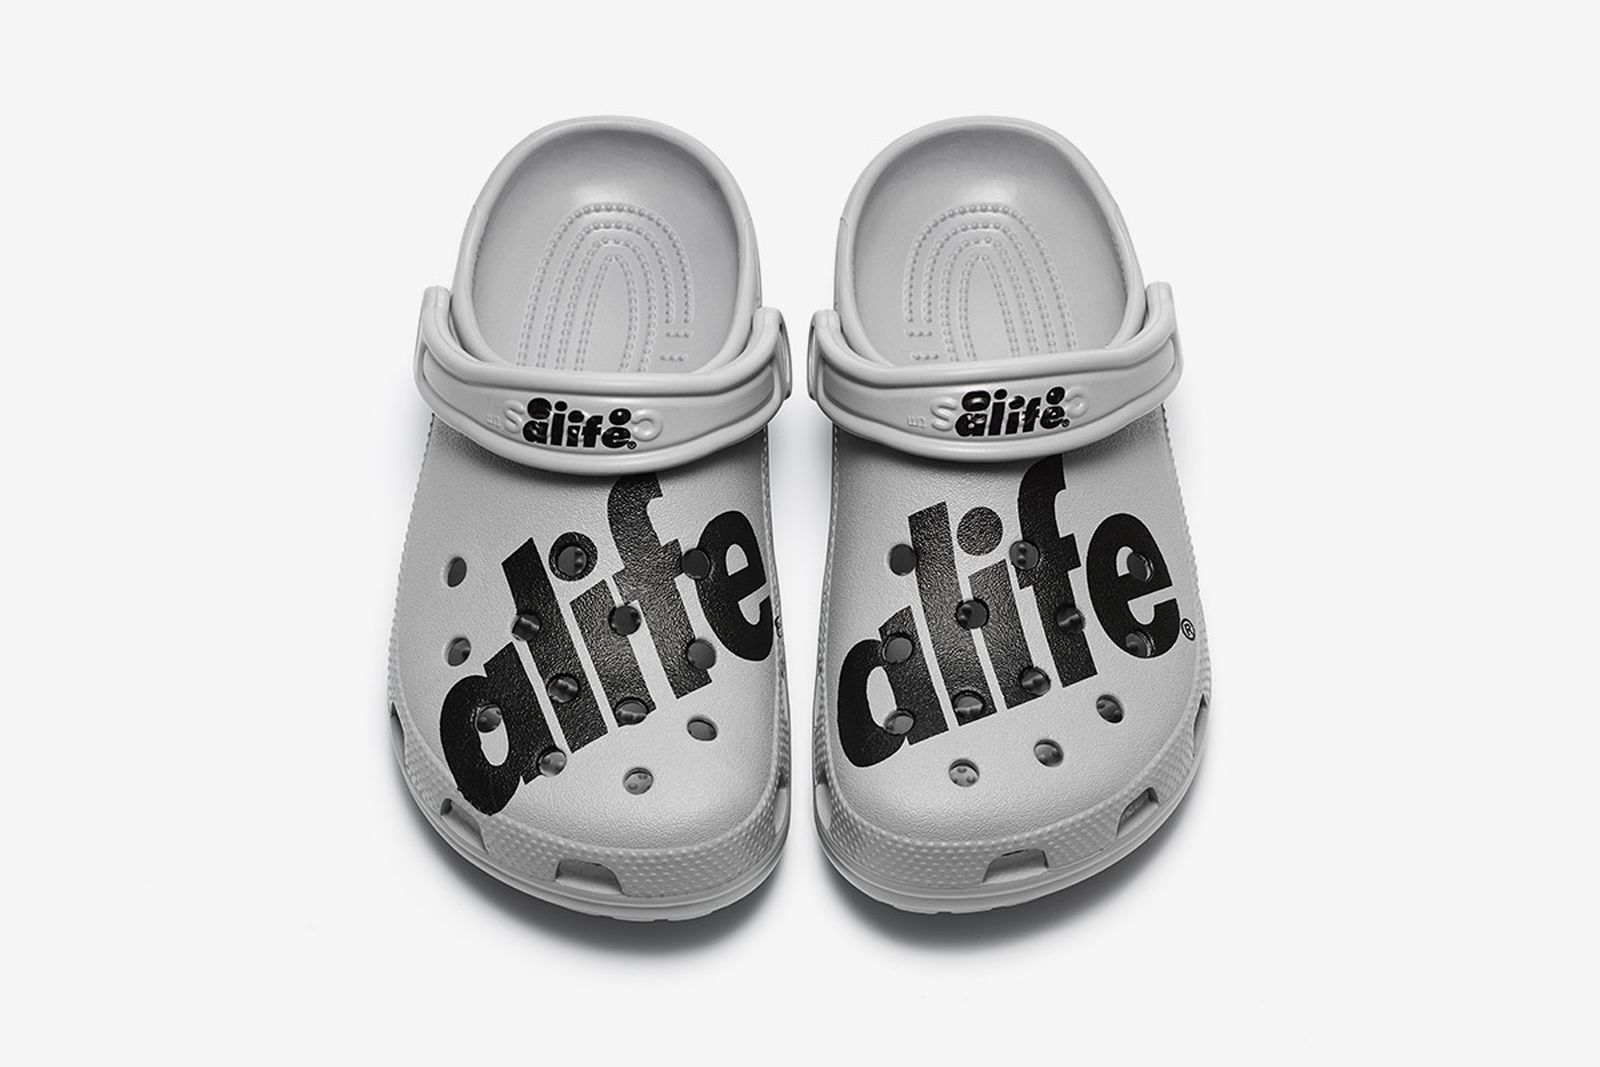 alife-crocs-collaboration-release-date-price-03